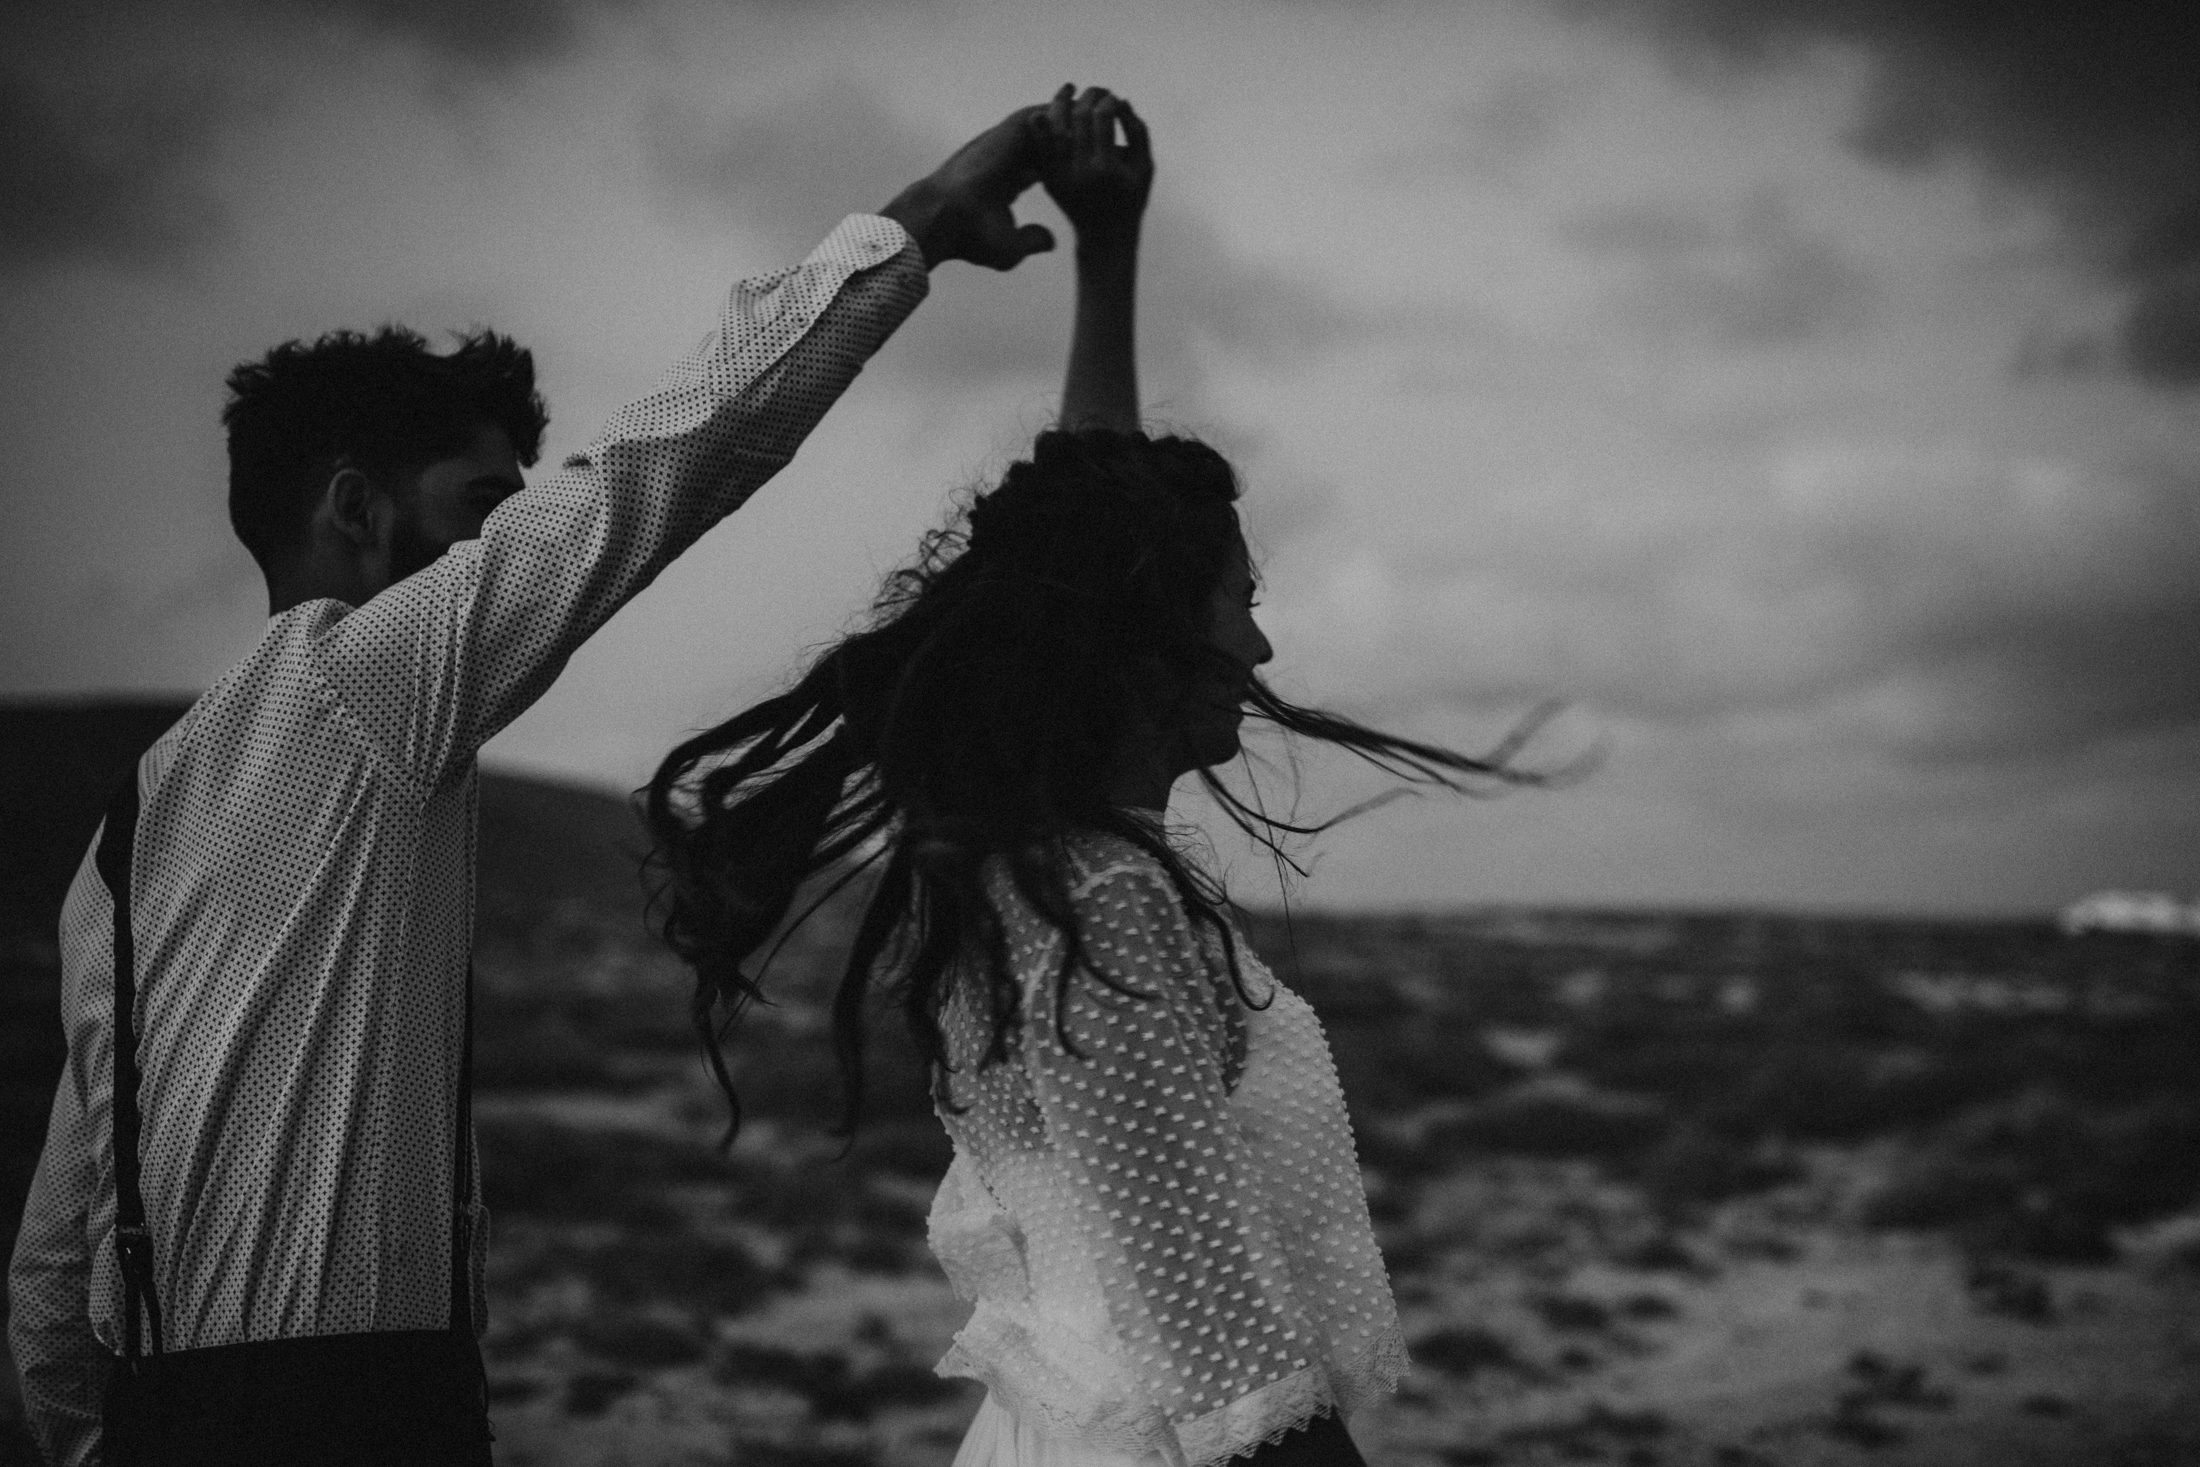 Wedding_Photographer_Mallorca_Daniela-Marquardt_Photography_CanaryIslands_Lanzarote_Iceland_Tuskany_Santorini_Portugal_Schweiz_Austria_Bayern_Elopement_Hochzeitsfotograf_40